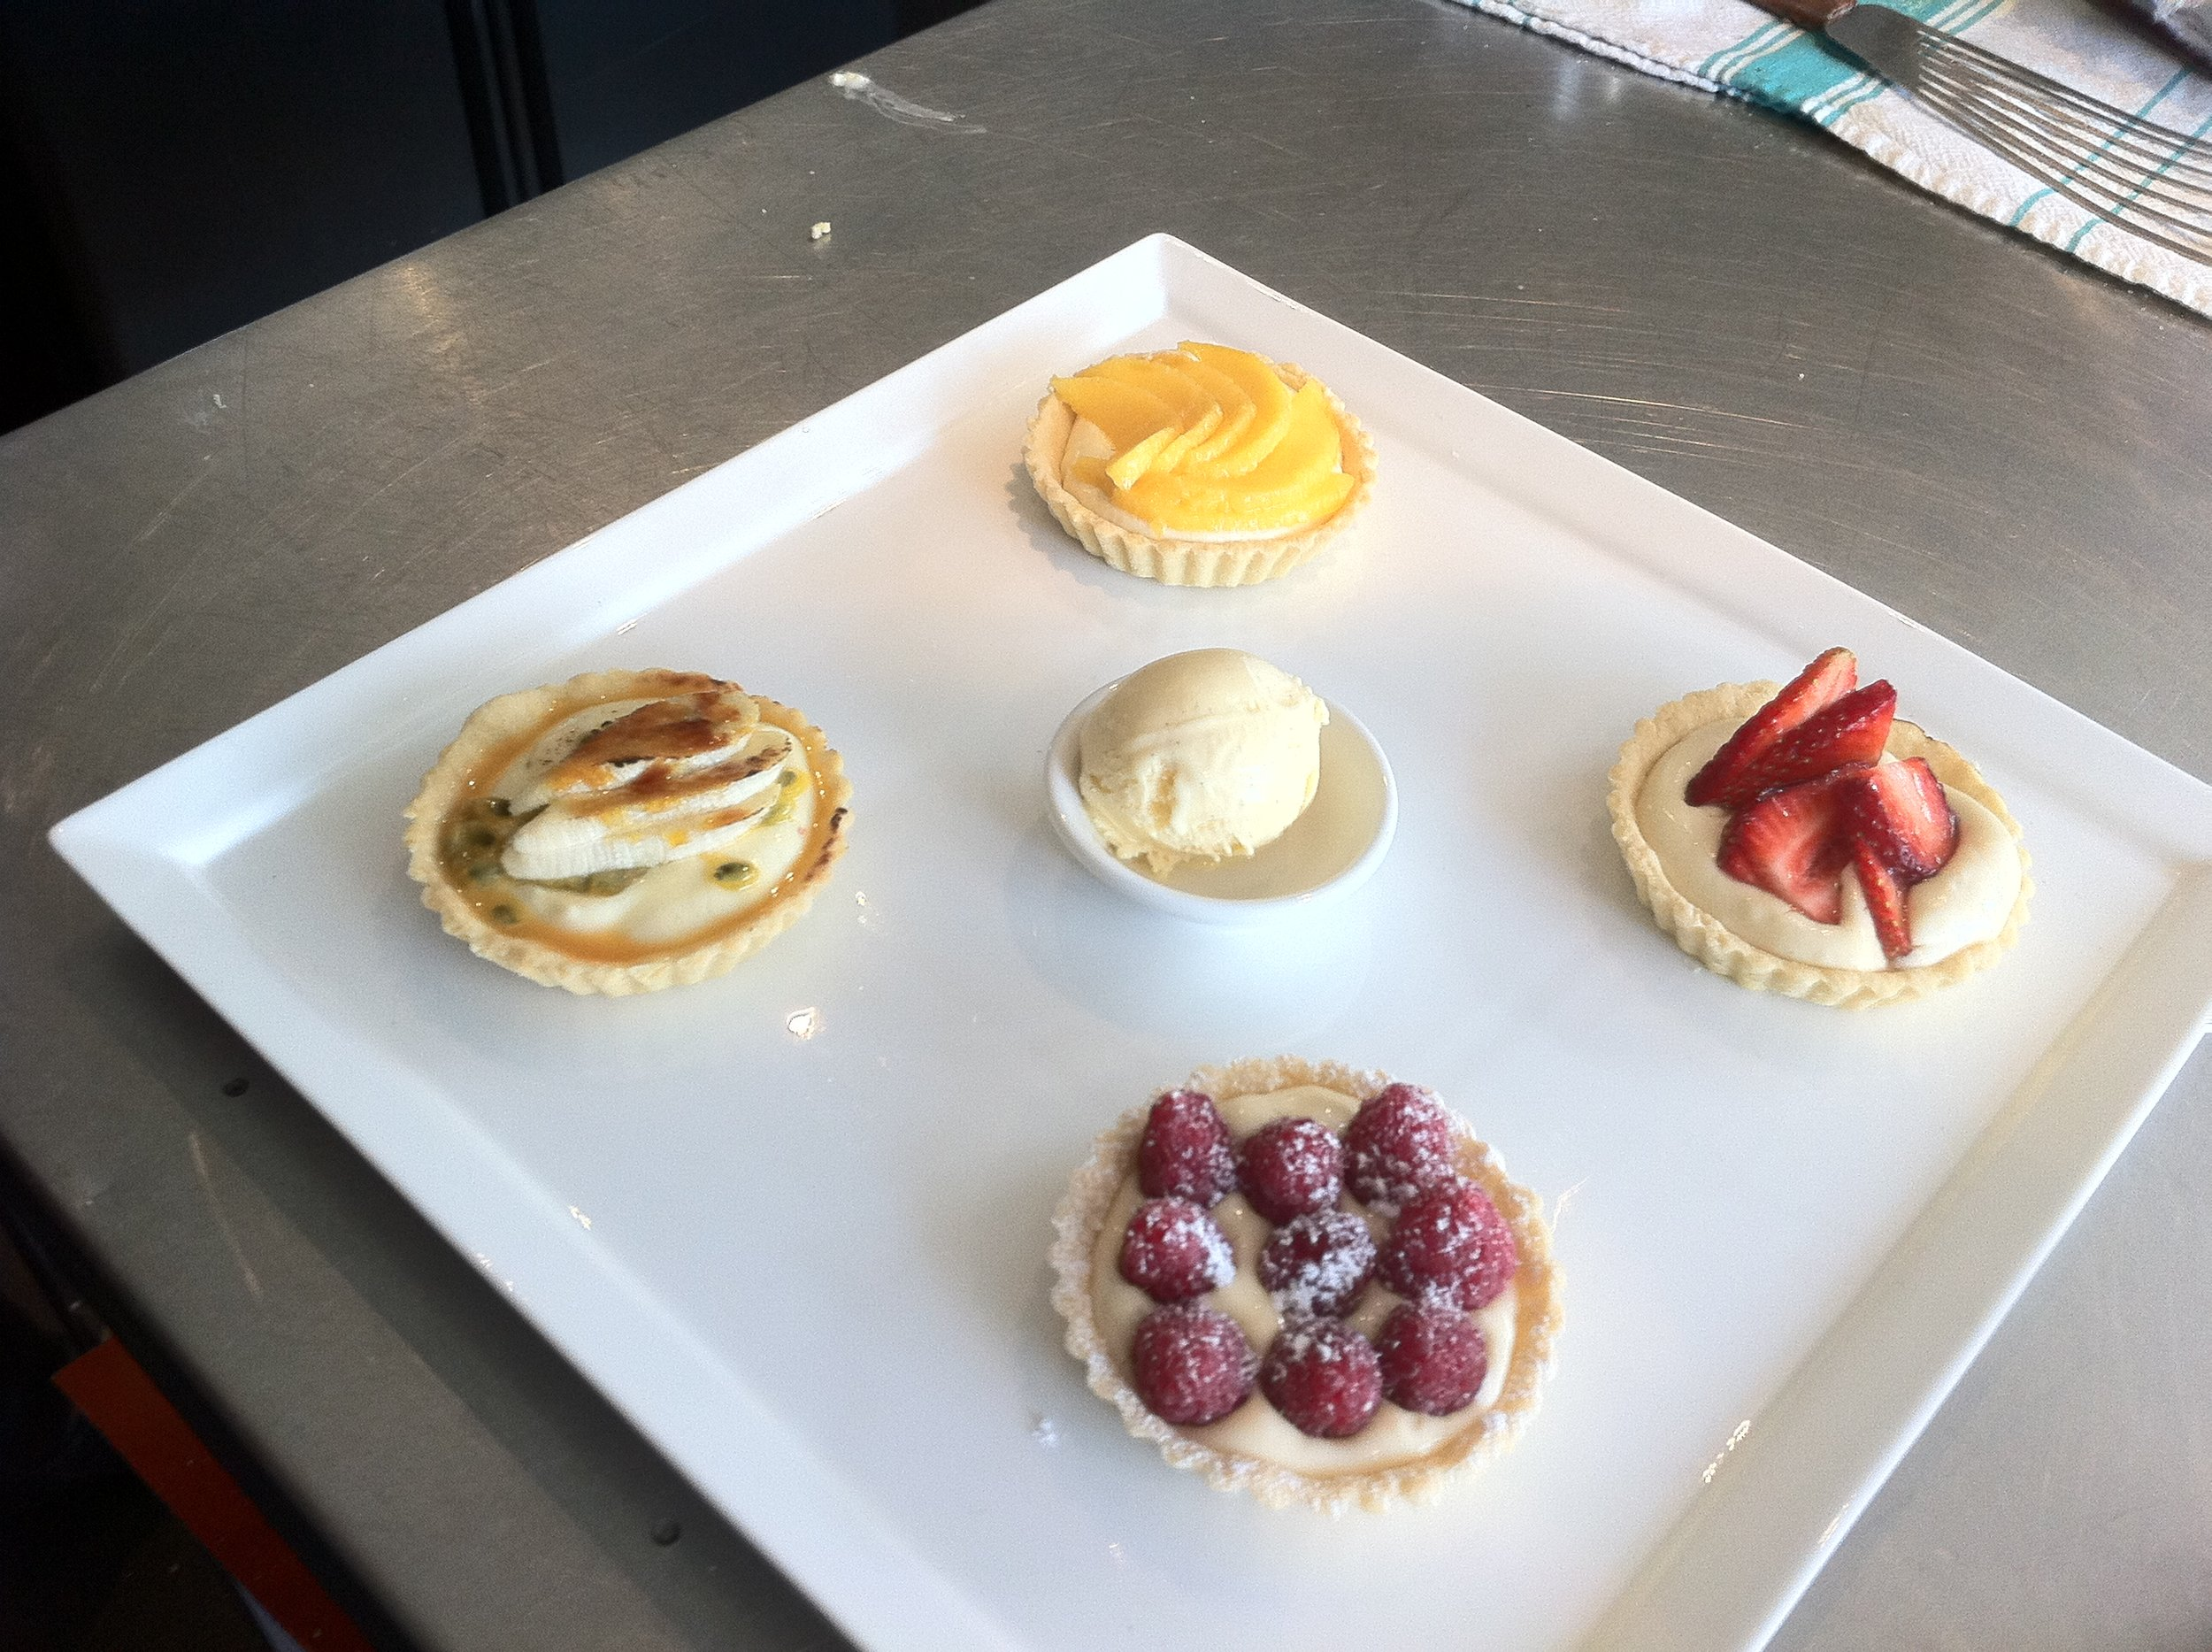 Four small sweet tarts